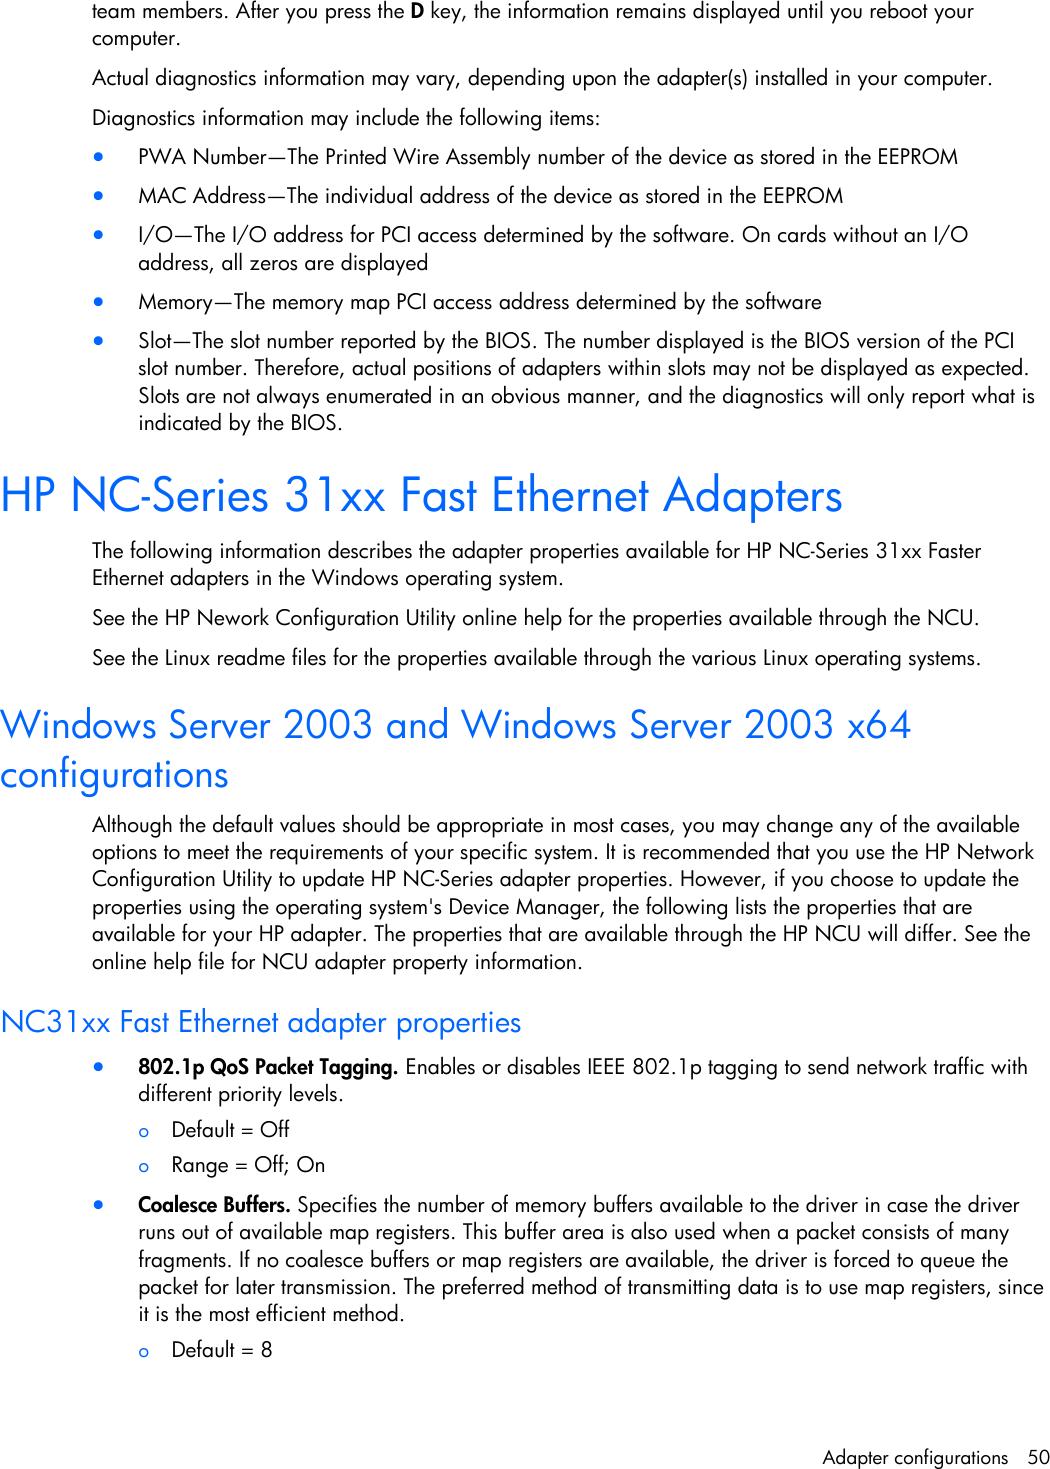 HP NC3163 NDIS2 WINDOWS 8 X64 TREIBER